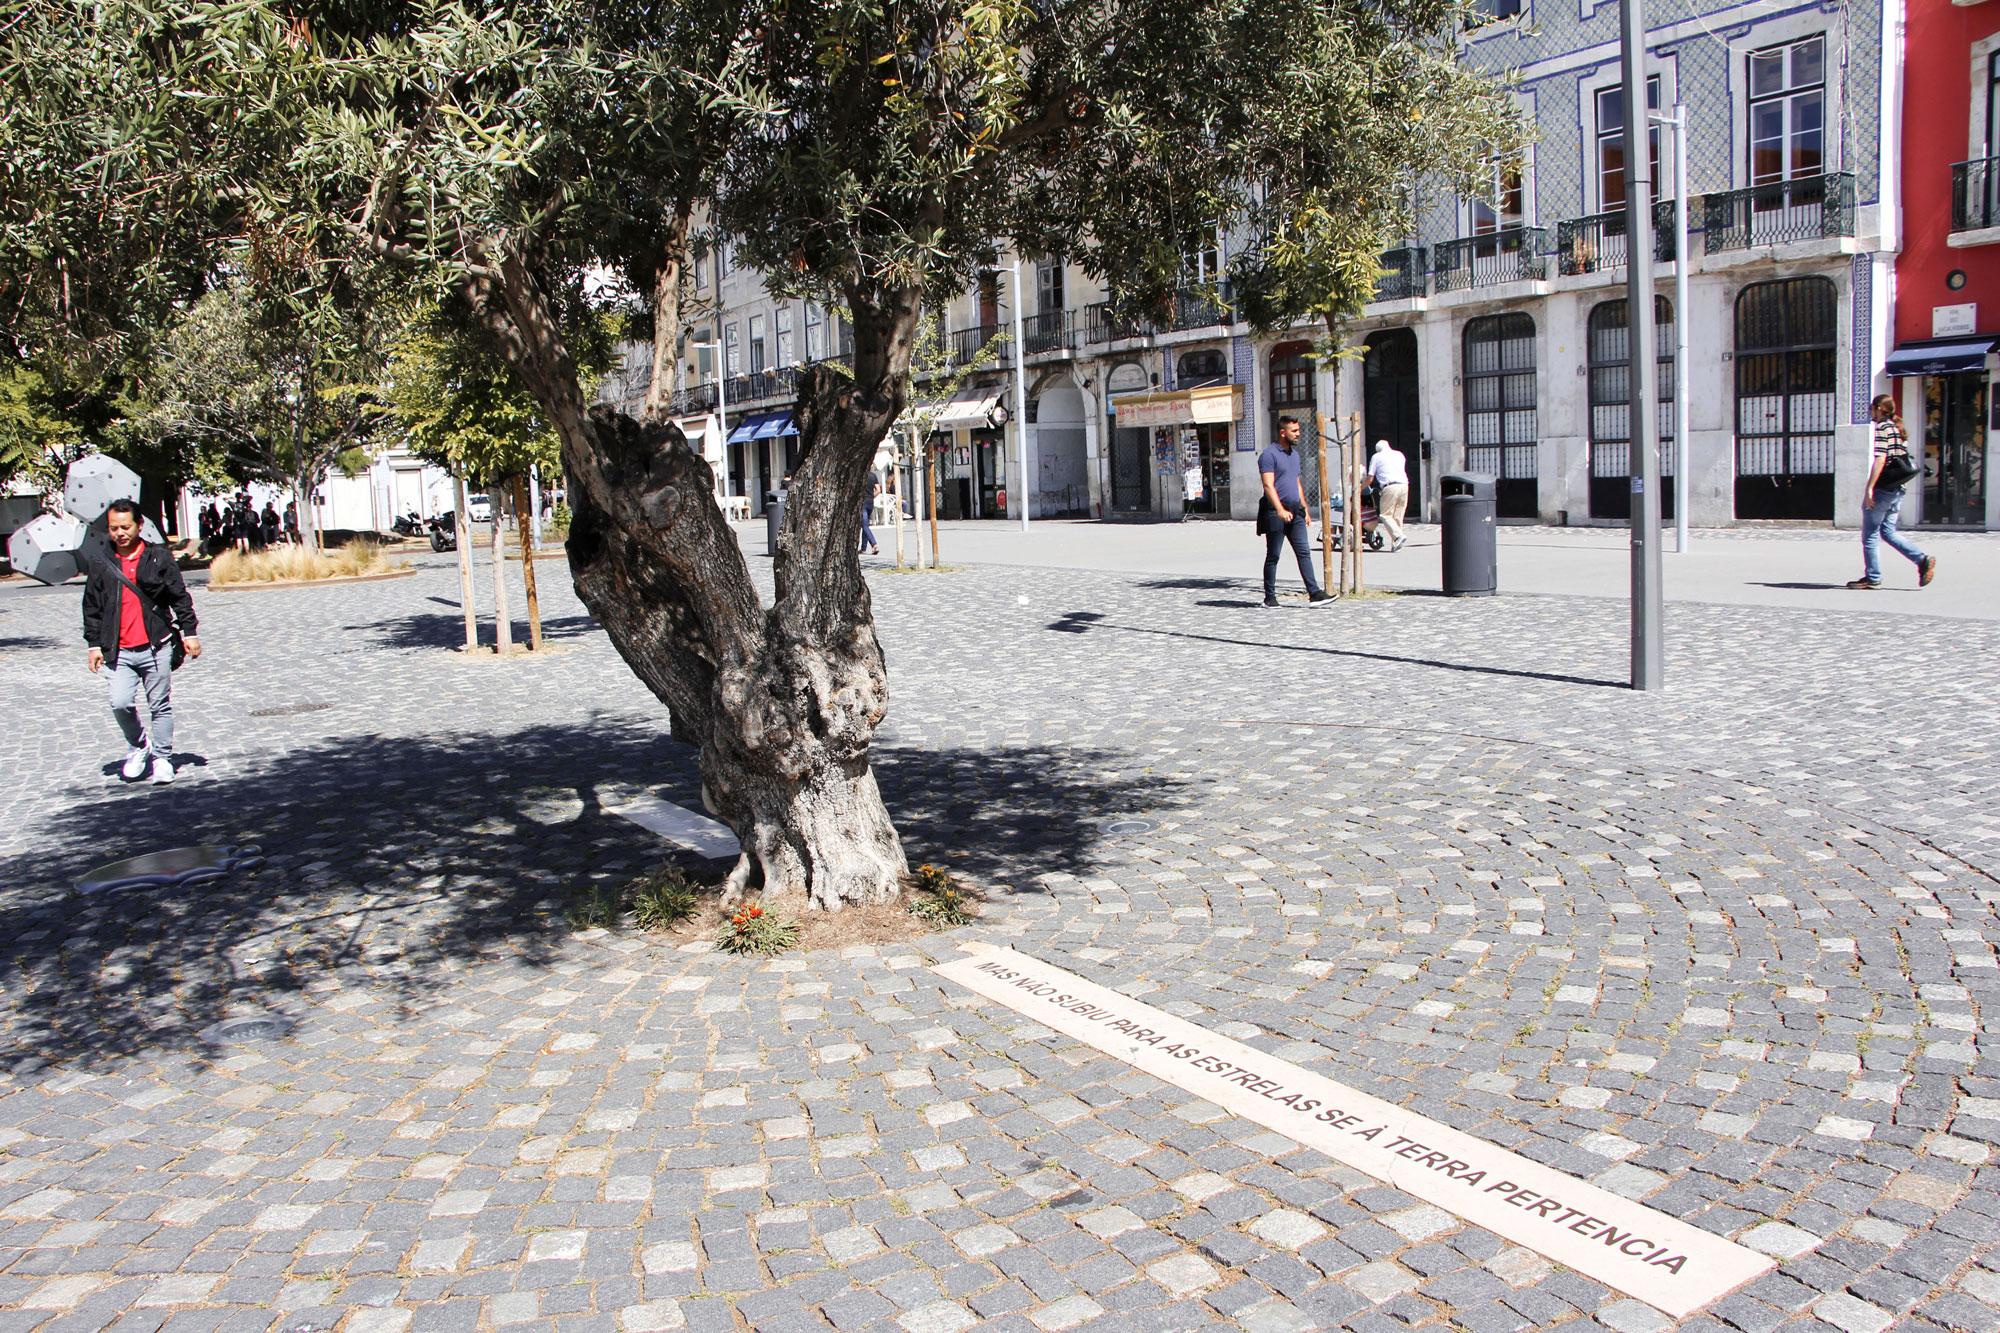 Oliveira onde as cinzas de José Saramago foram depositadas (CMMN, 2019)